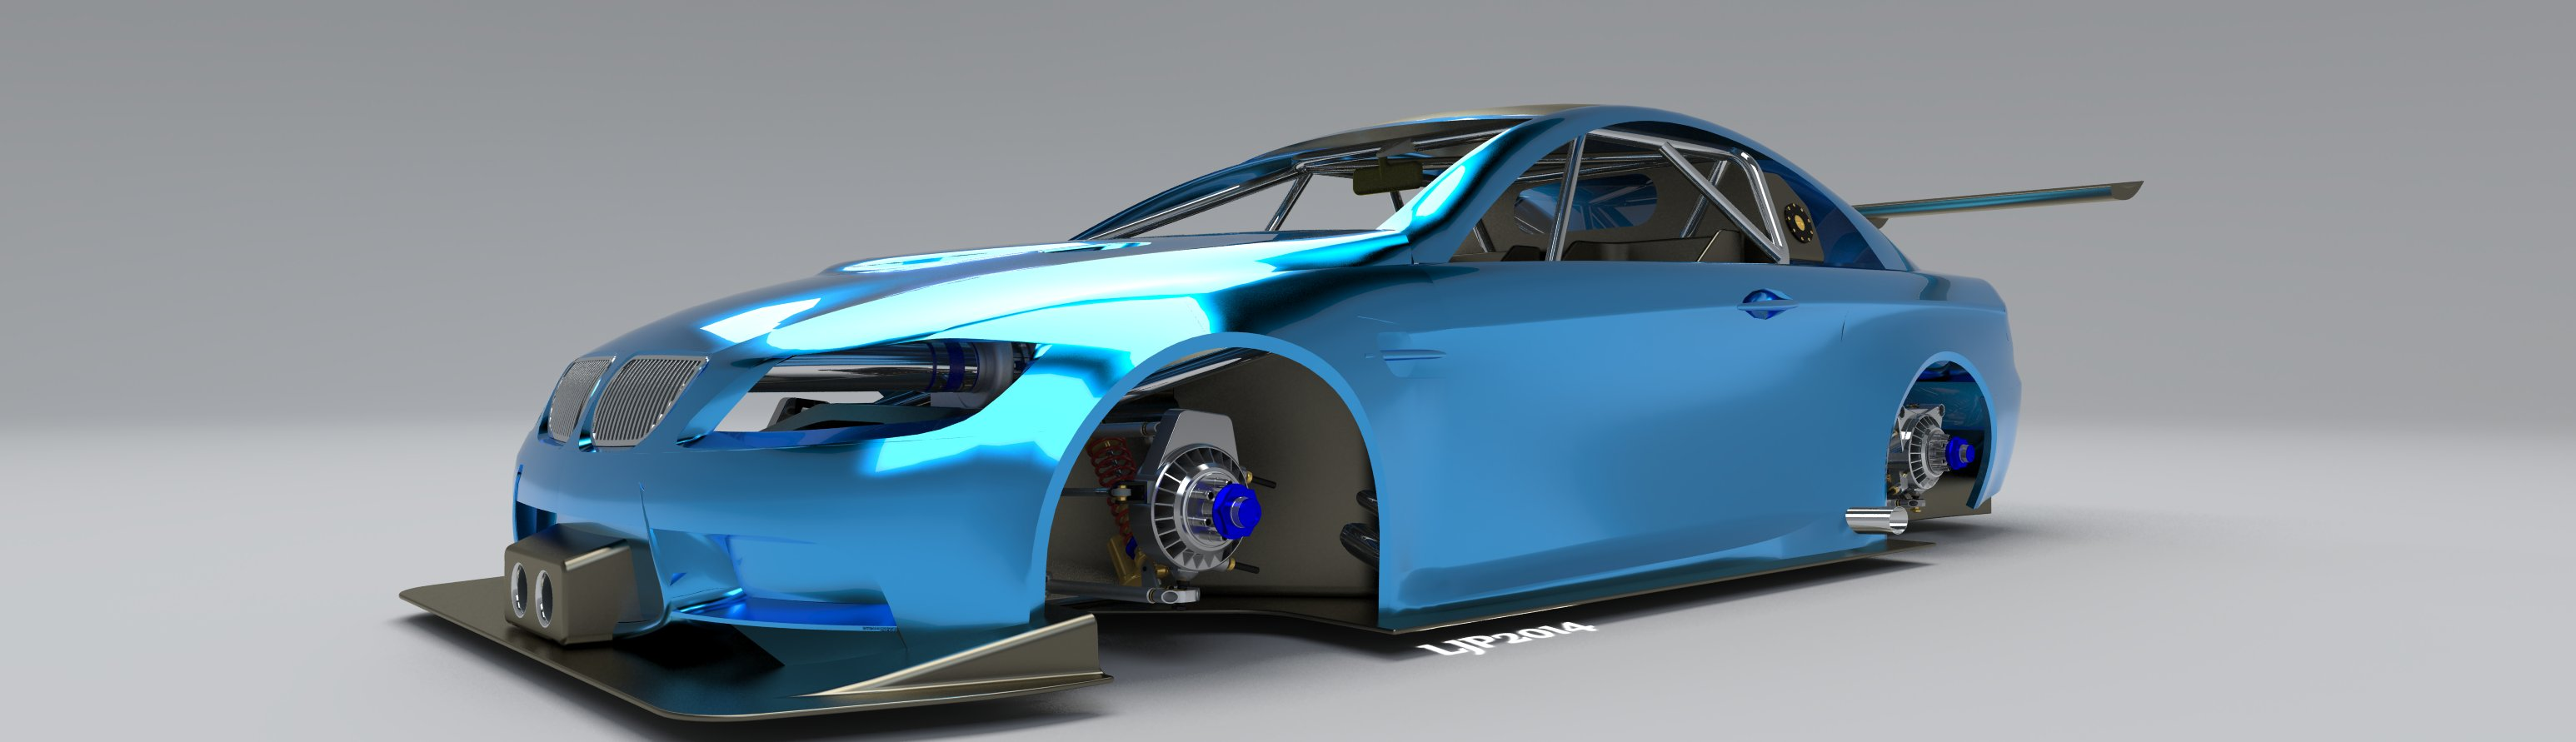 PEASNELL RACING DESIGN _ CONCEPT SKETCH _BMW_RACECAR (8)